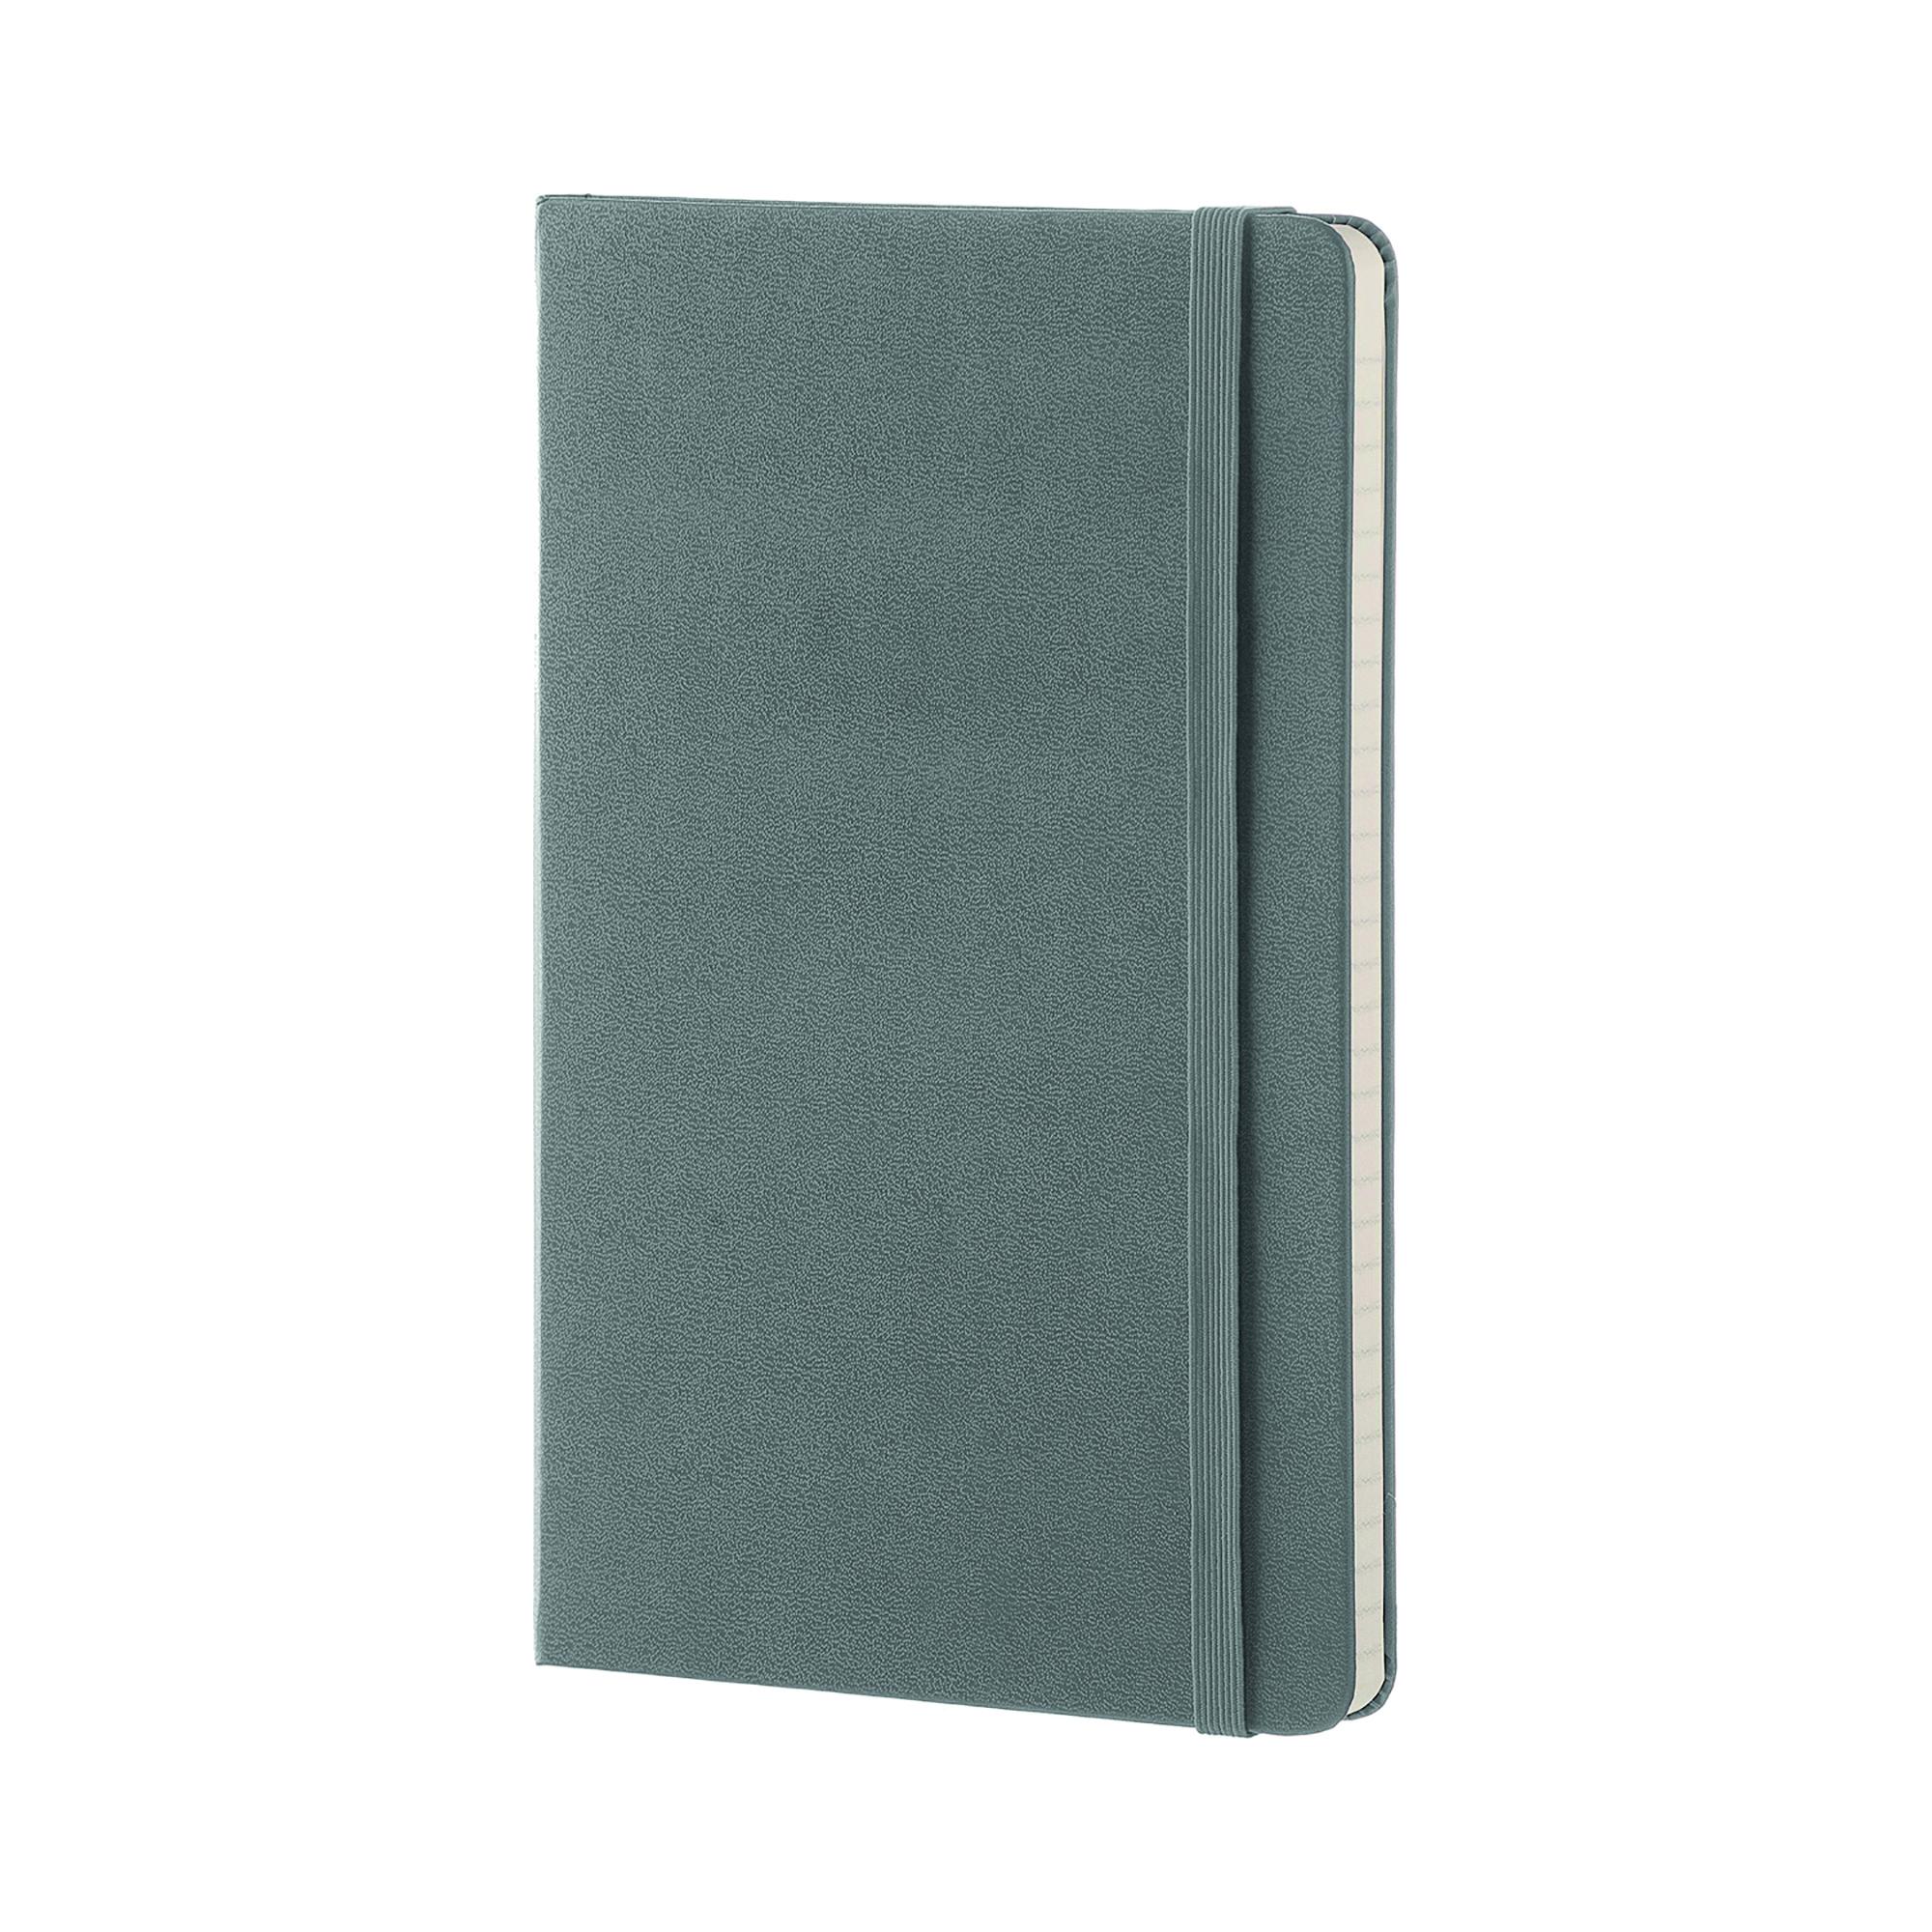 Carnet classique grand format Moleskine® - 10-1066-11